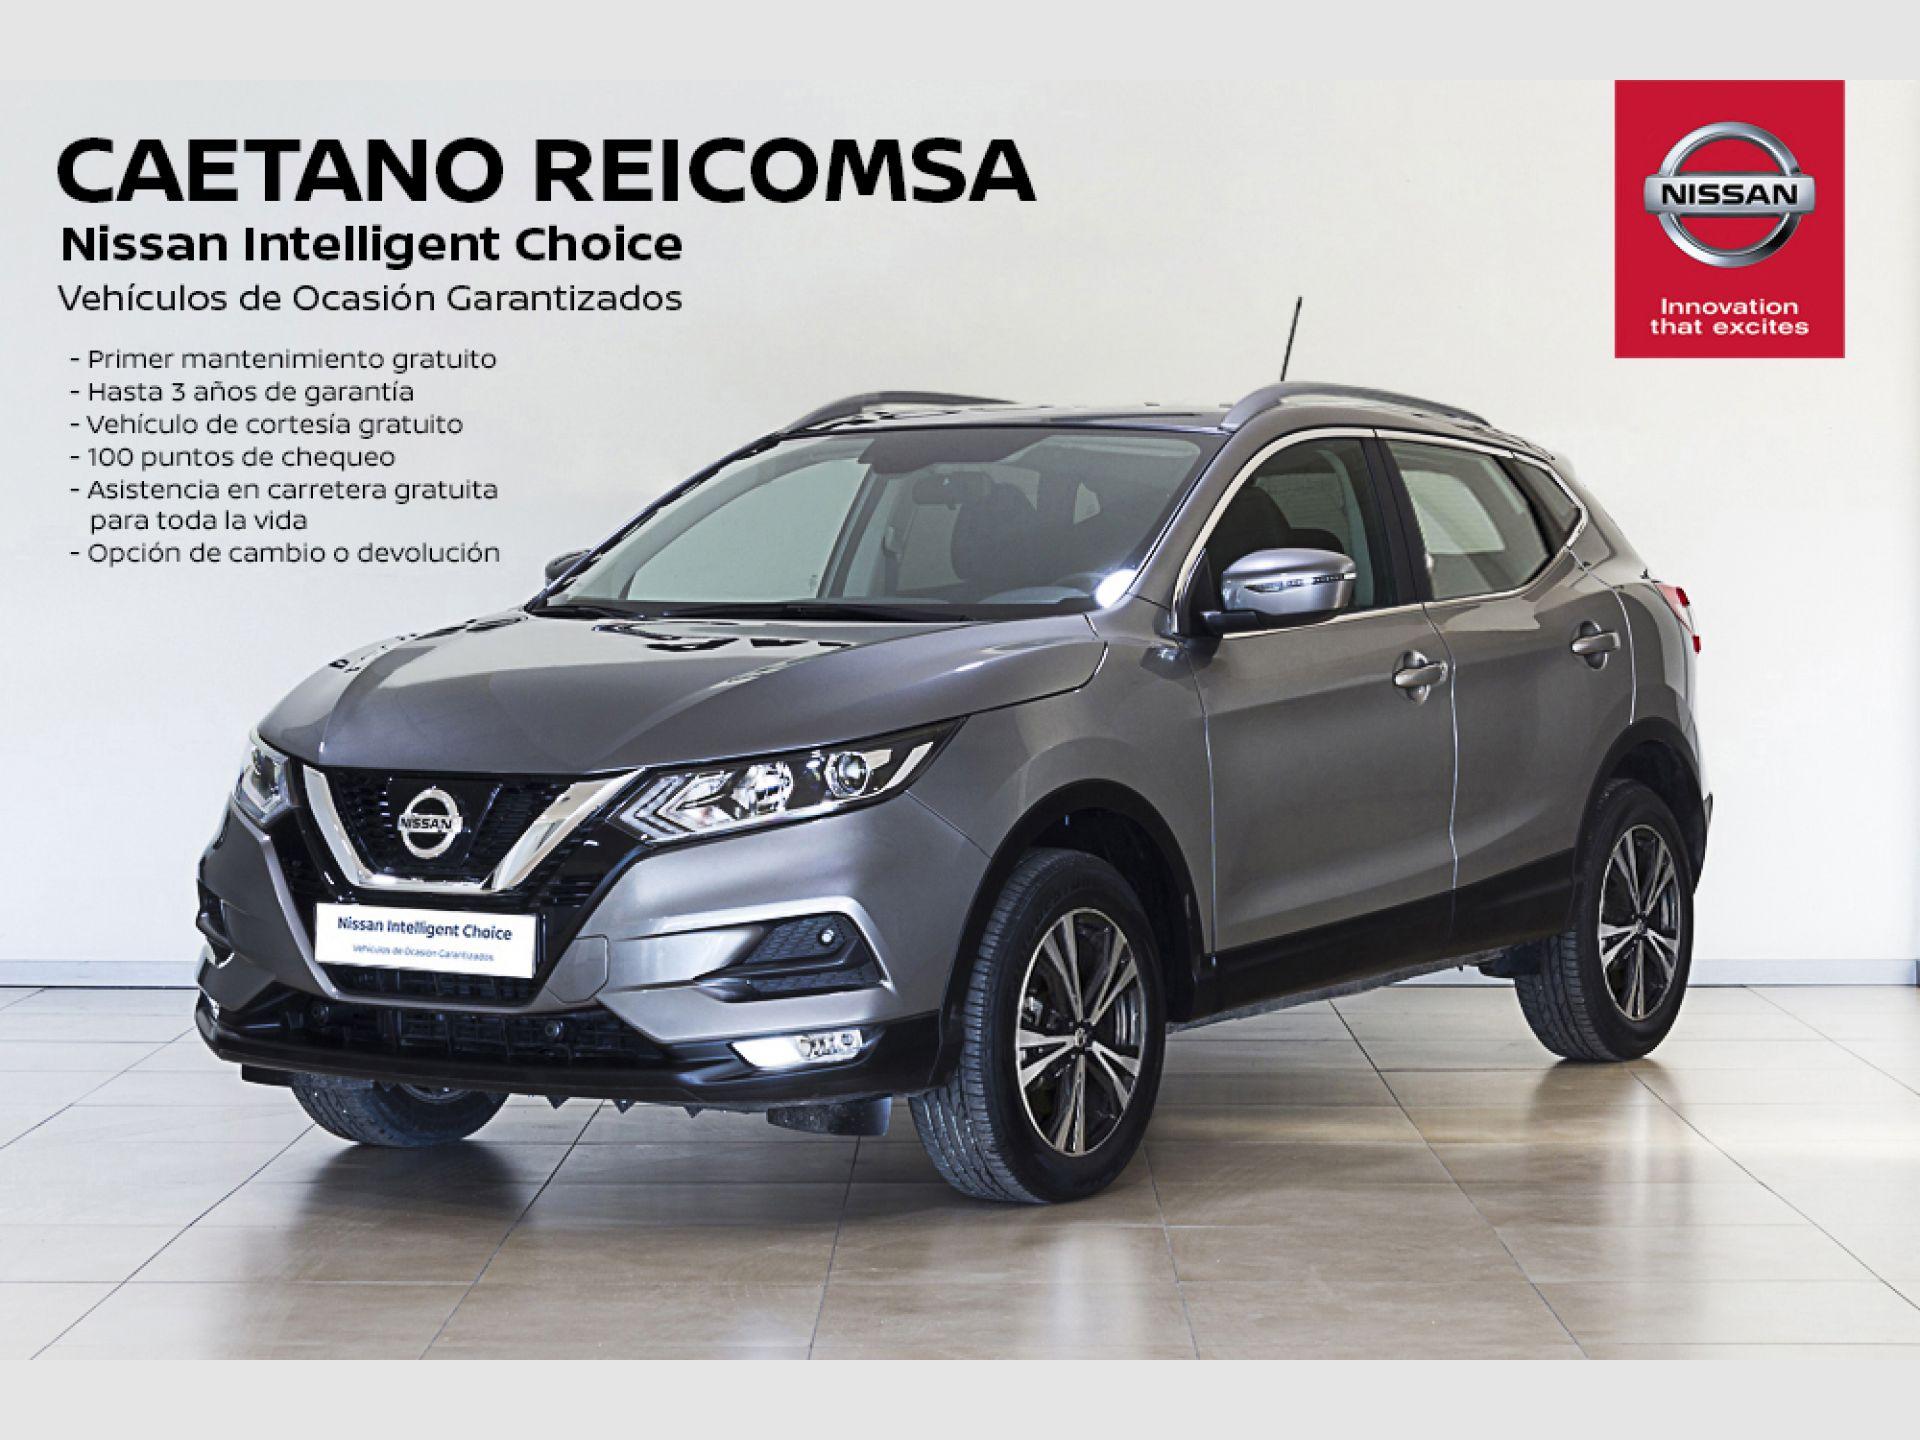 Nissan Qashqai DIG-T 103 kW (140 CV) E6D ACENTA N-VISION segunda mano Madrid